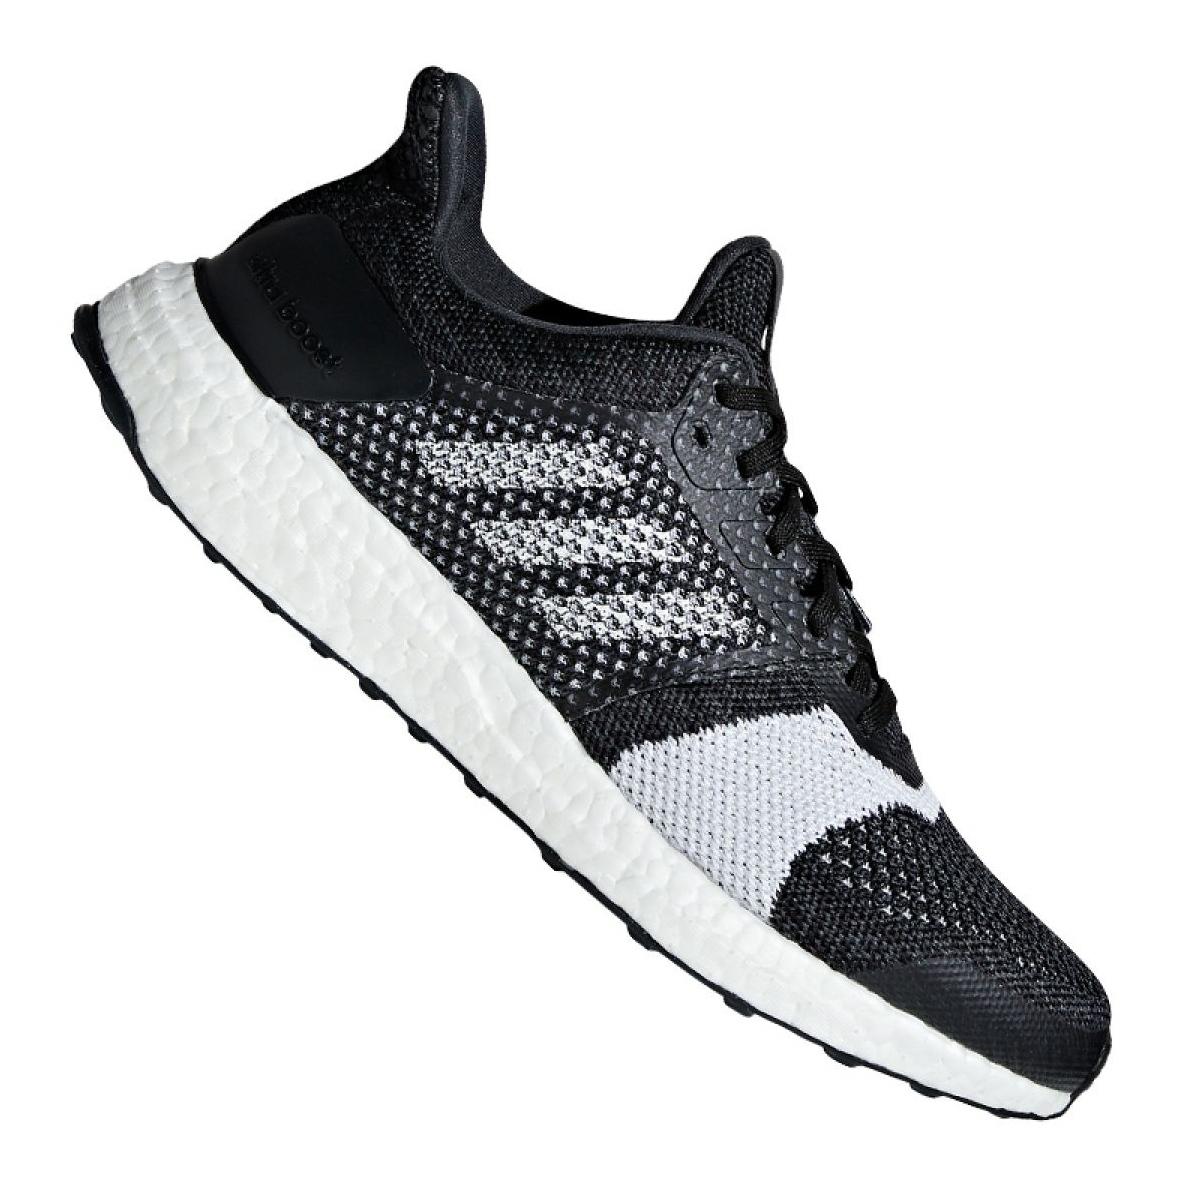 Black shoes St Adidas M B37694 UltraBoost m dChQstr